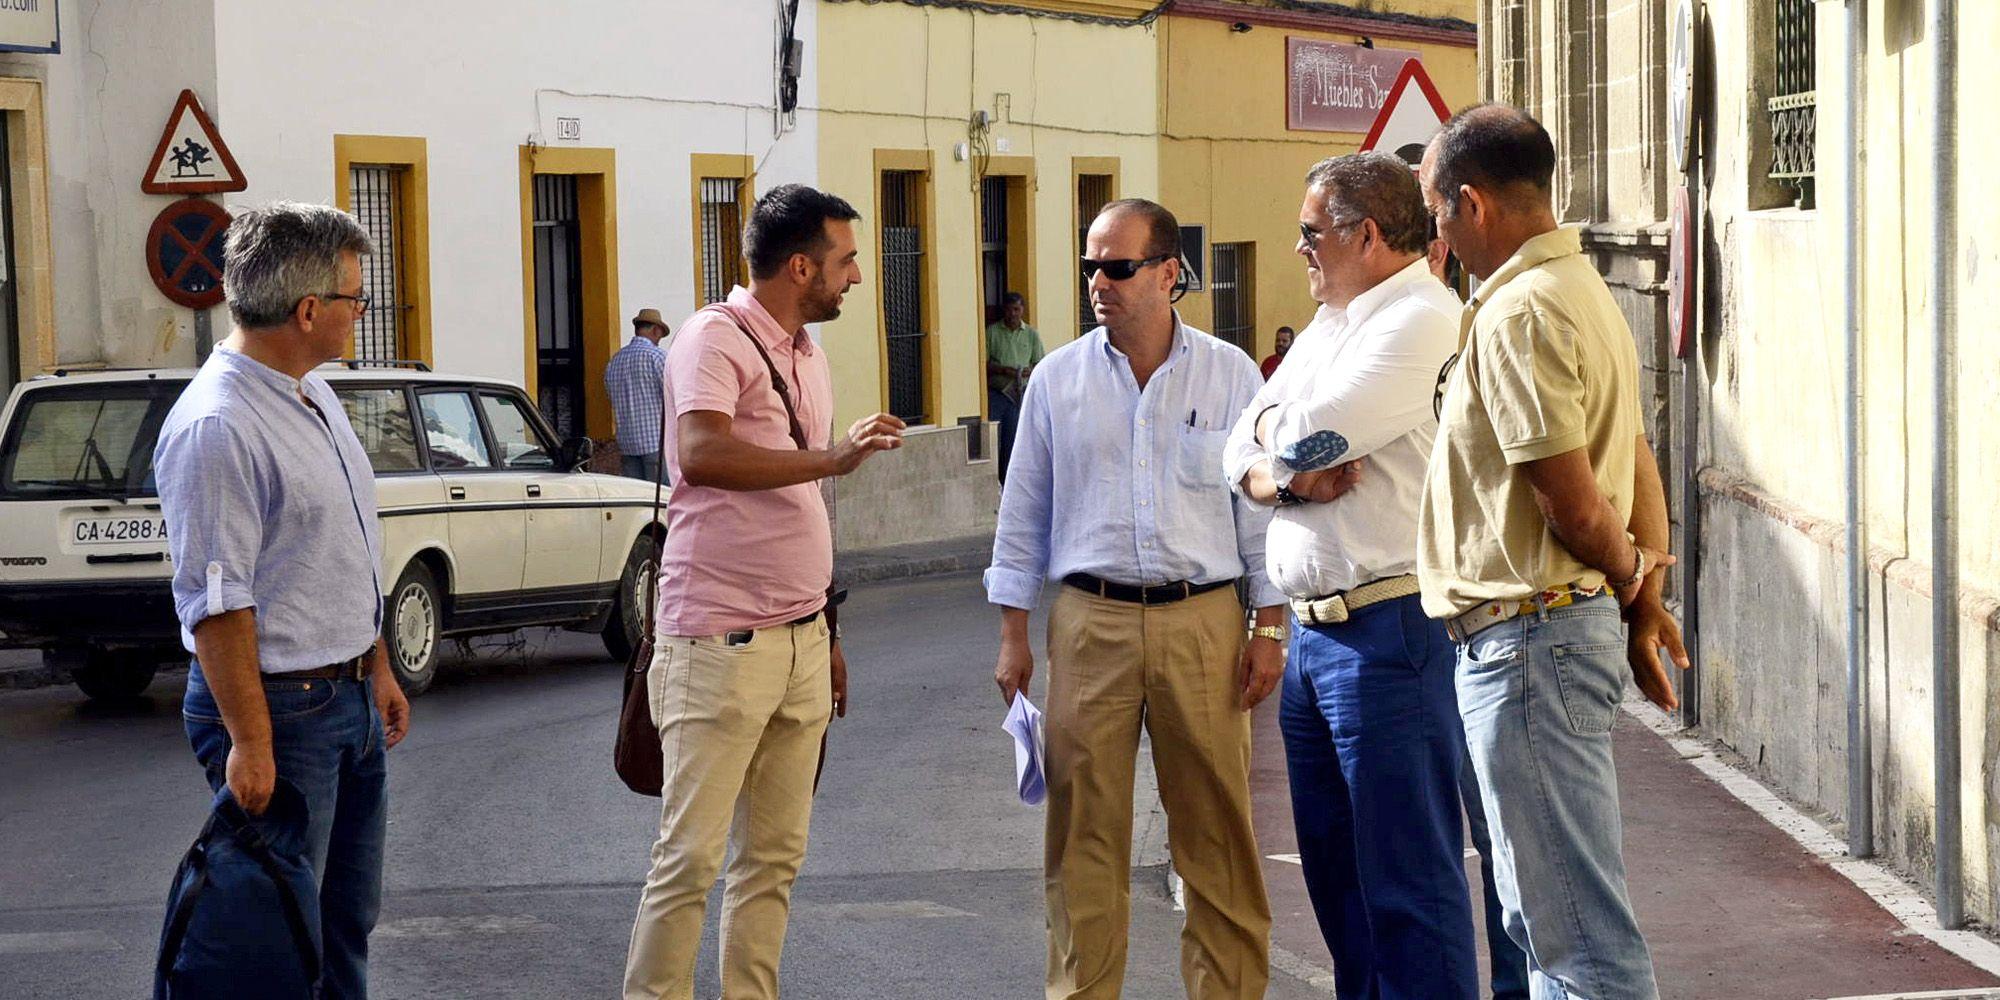 Calle Marques de Cadiz